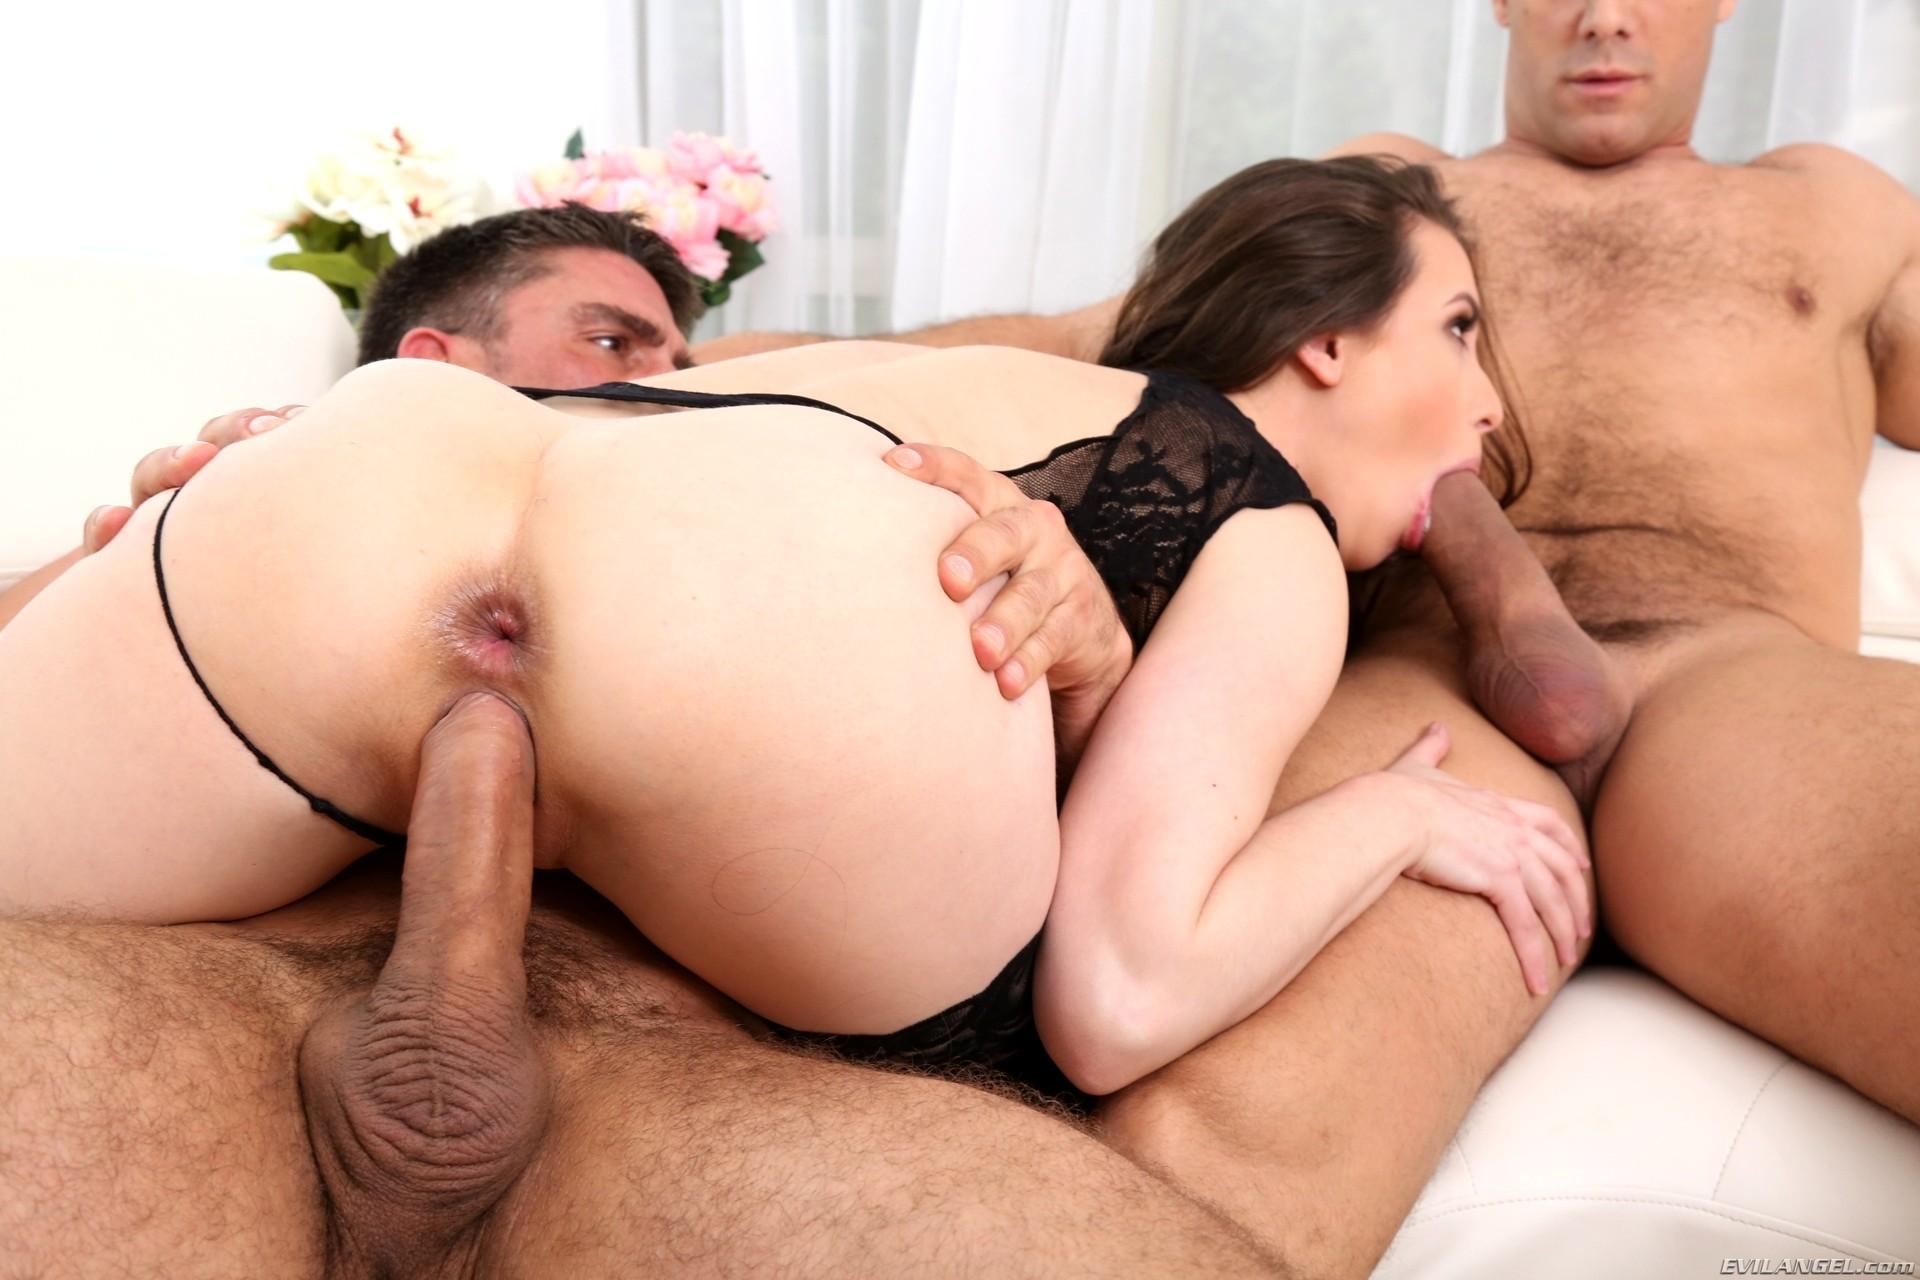 Bachelorette party sex pictures